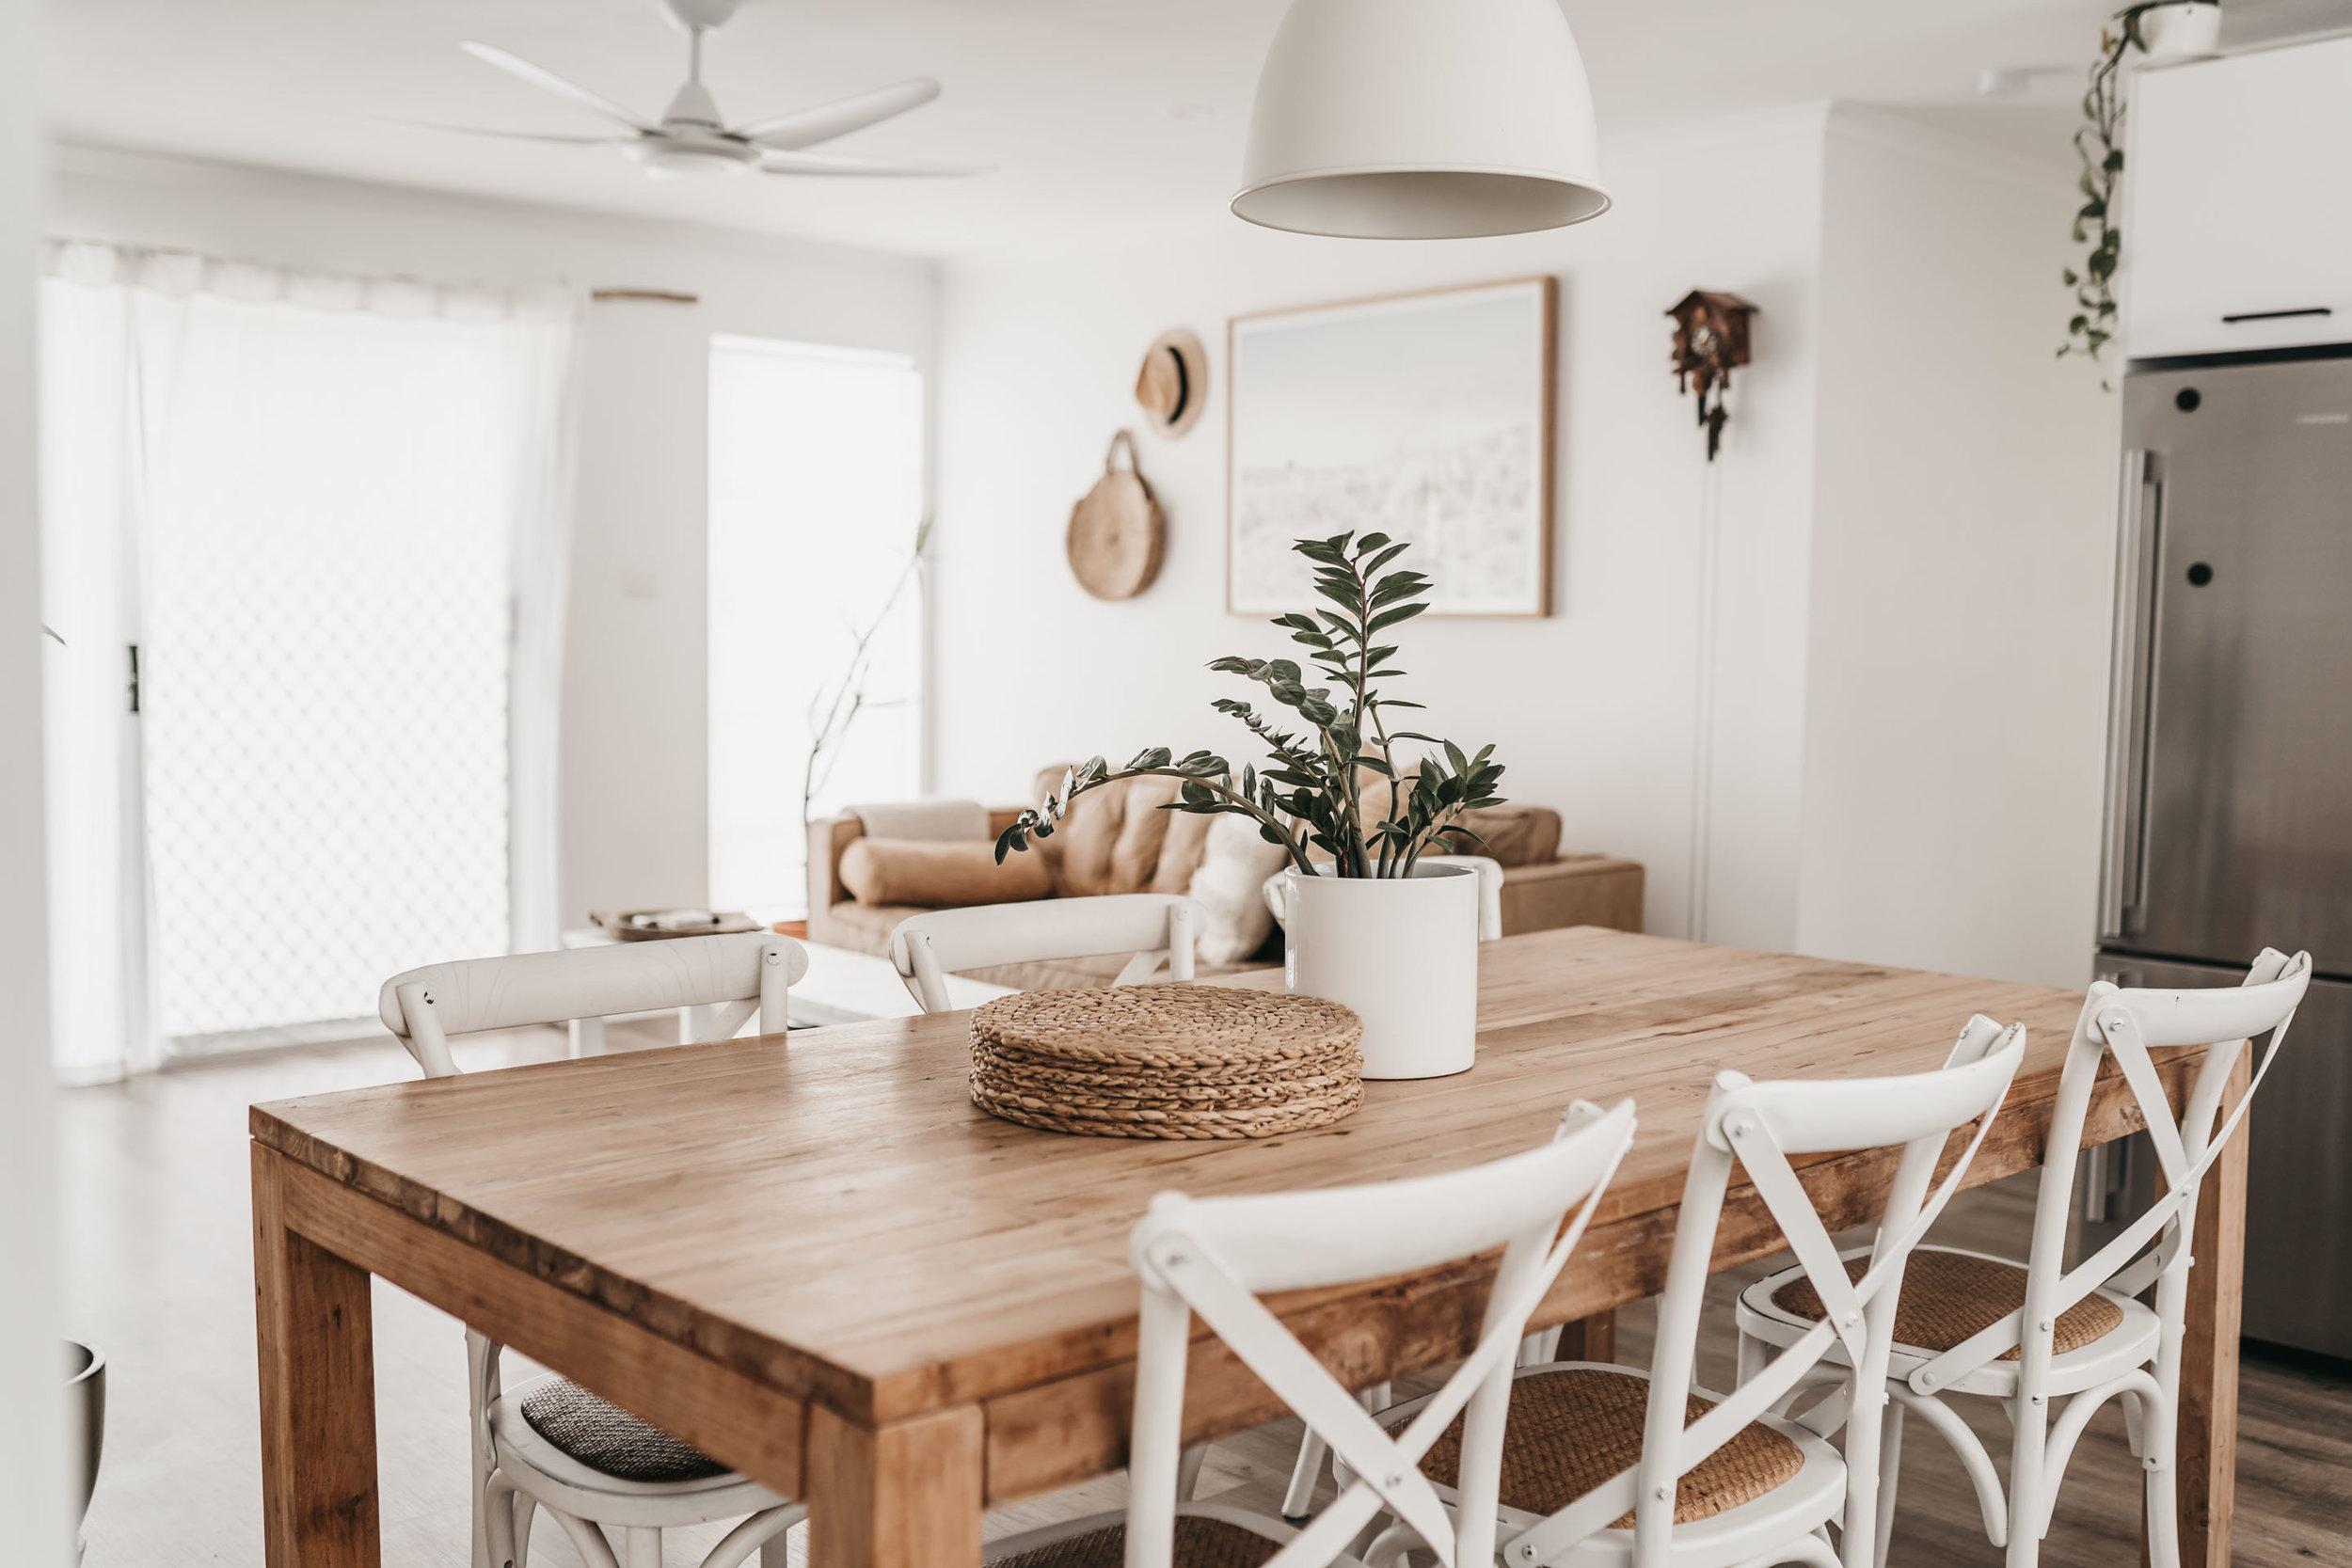 keira-mason-caba-cottage-dinning-room-table.jpg